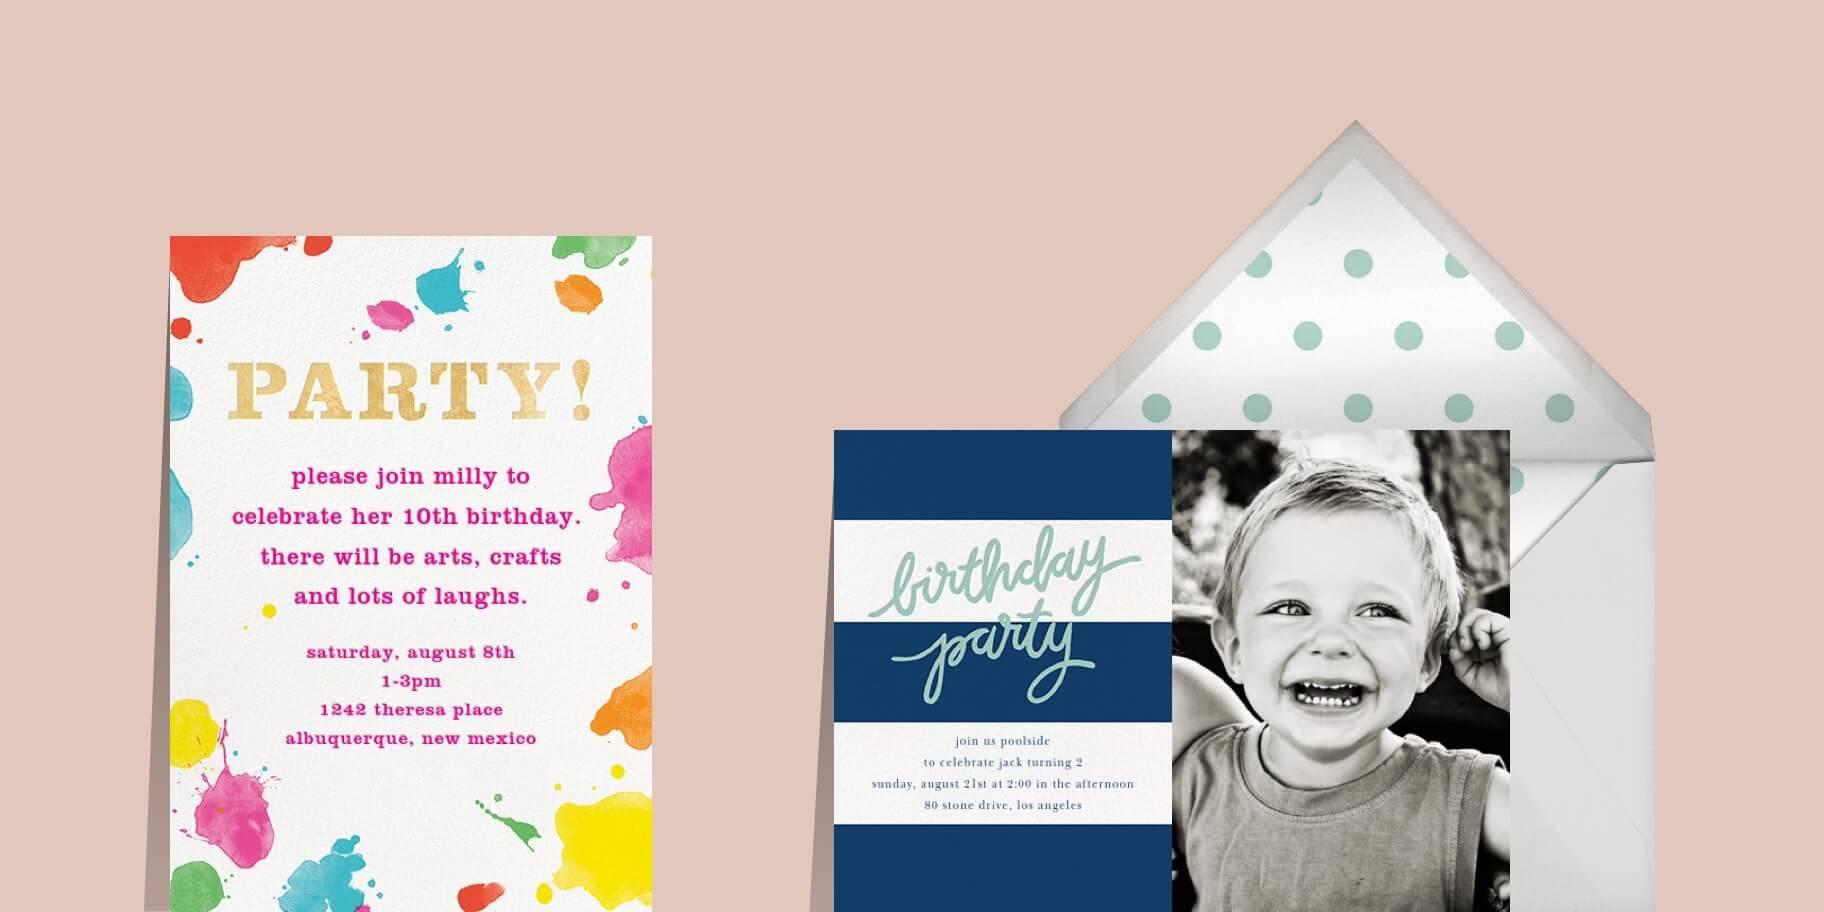 Kids' birthday invitations